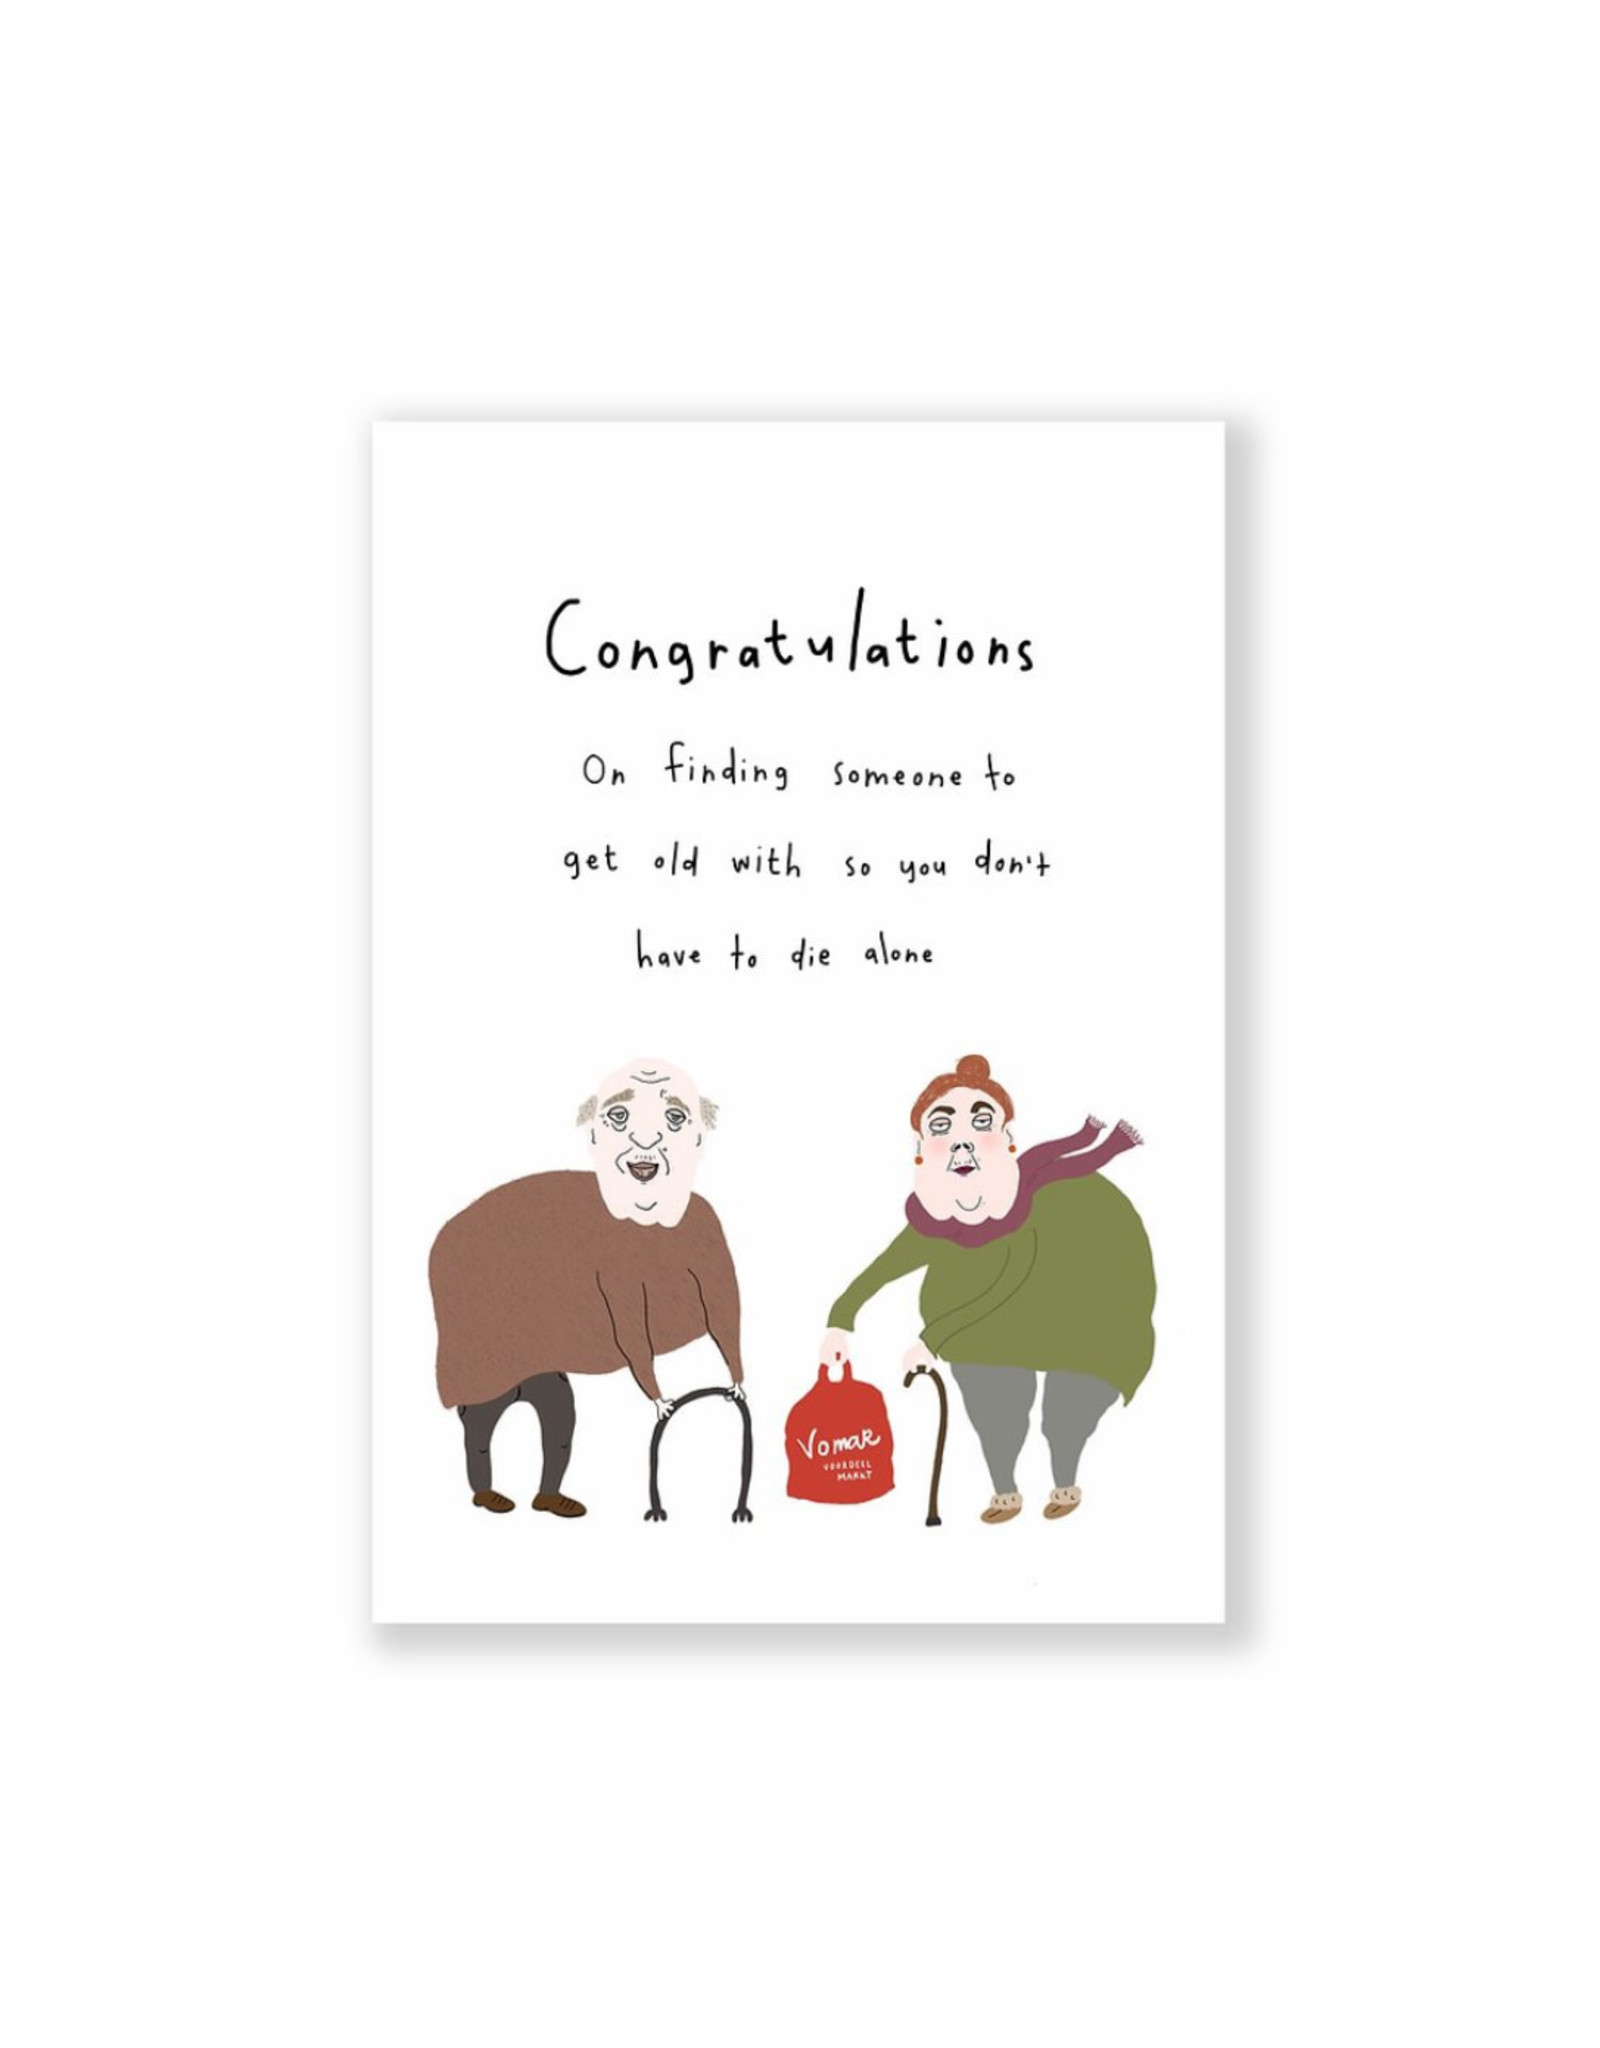 Eat Mielies Wenskaart - Wedding Congratulations  - Dubbele Kaart + Envelop - 11,5 x 16,5 - Blanco